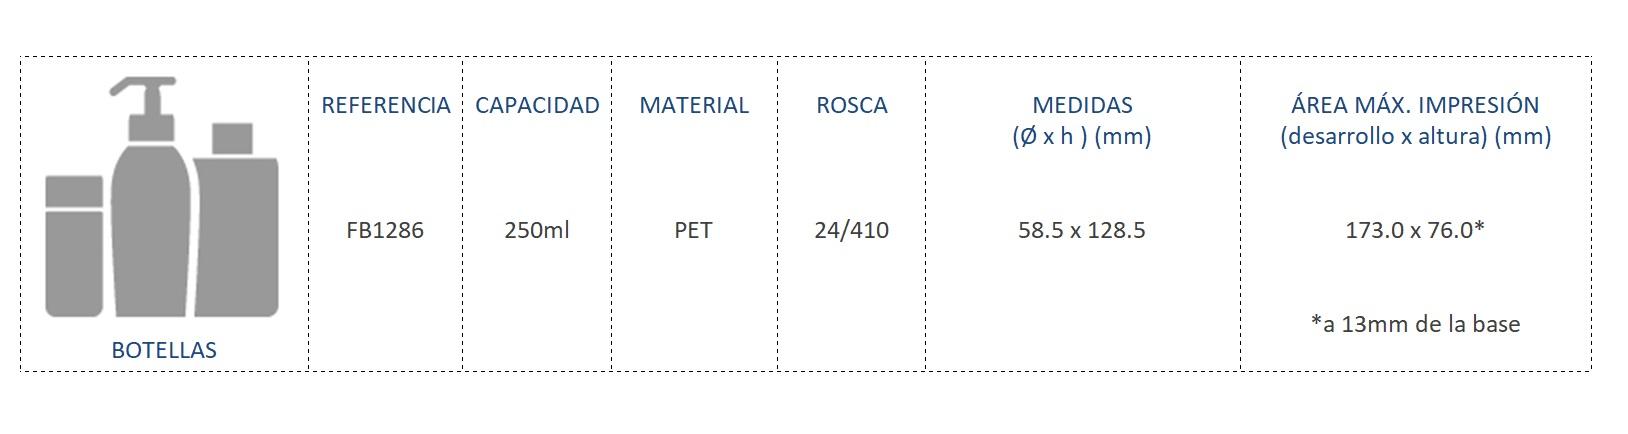 Cuadro de materiales botella FB1286